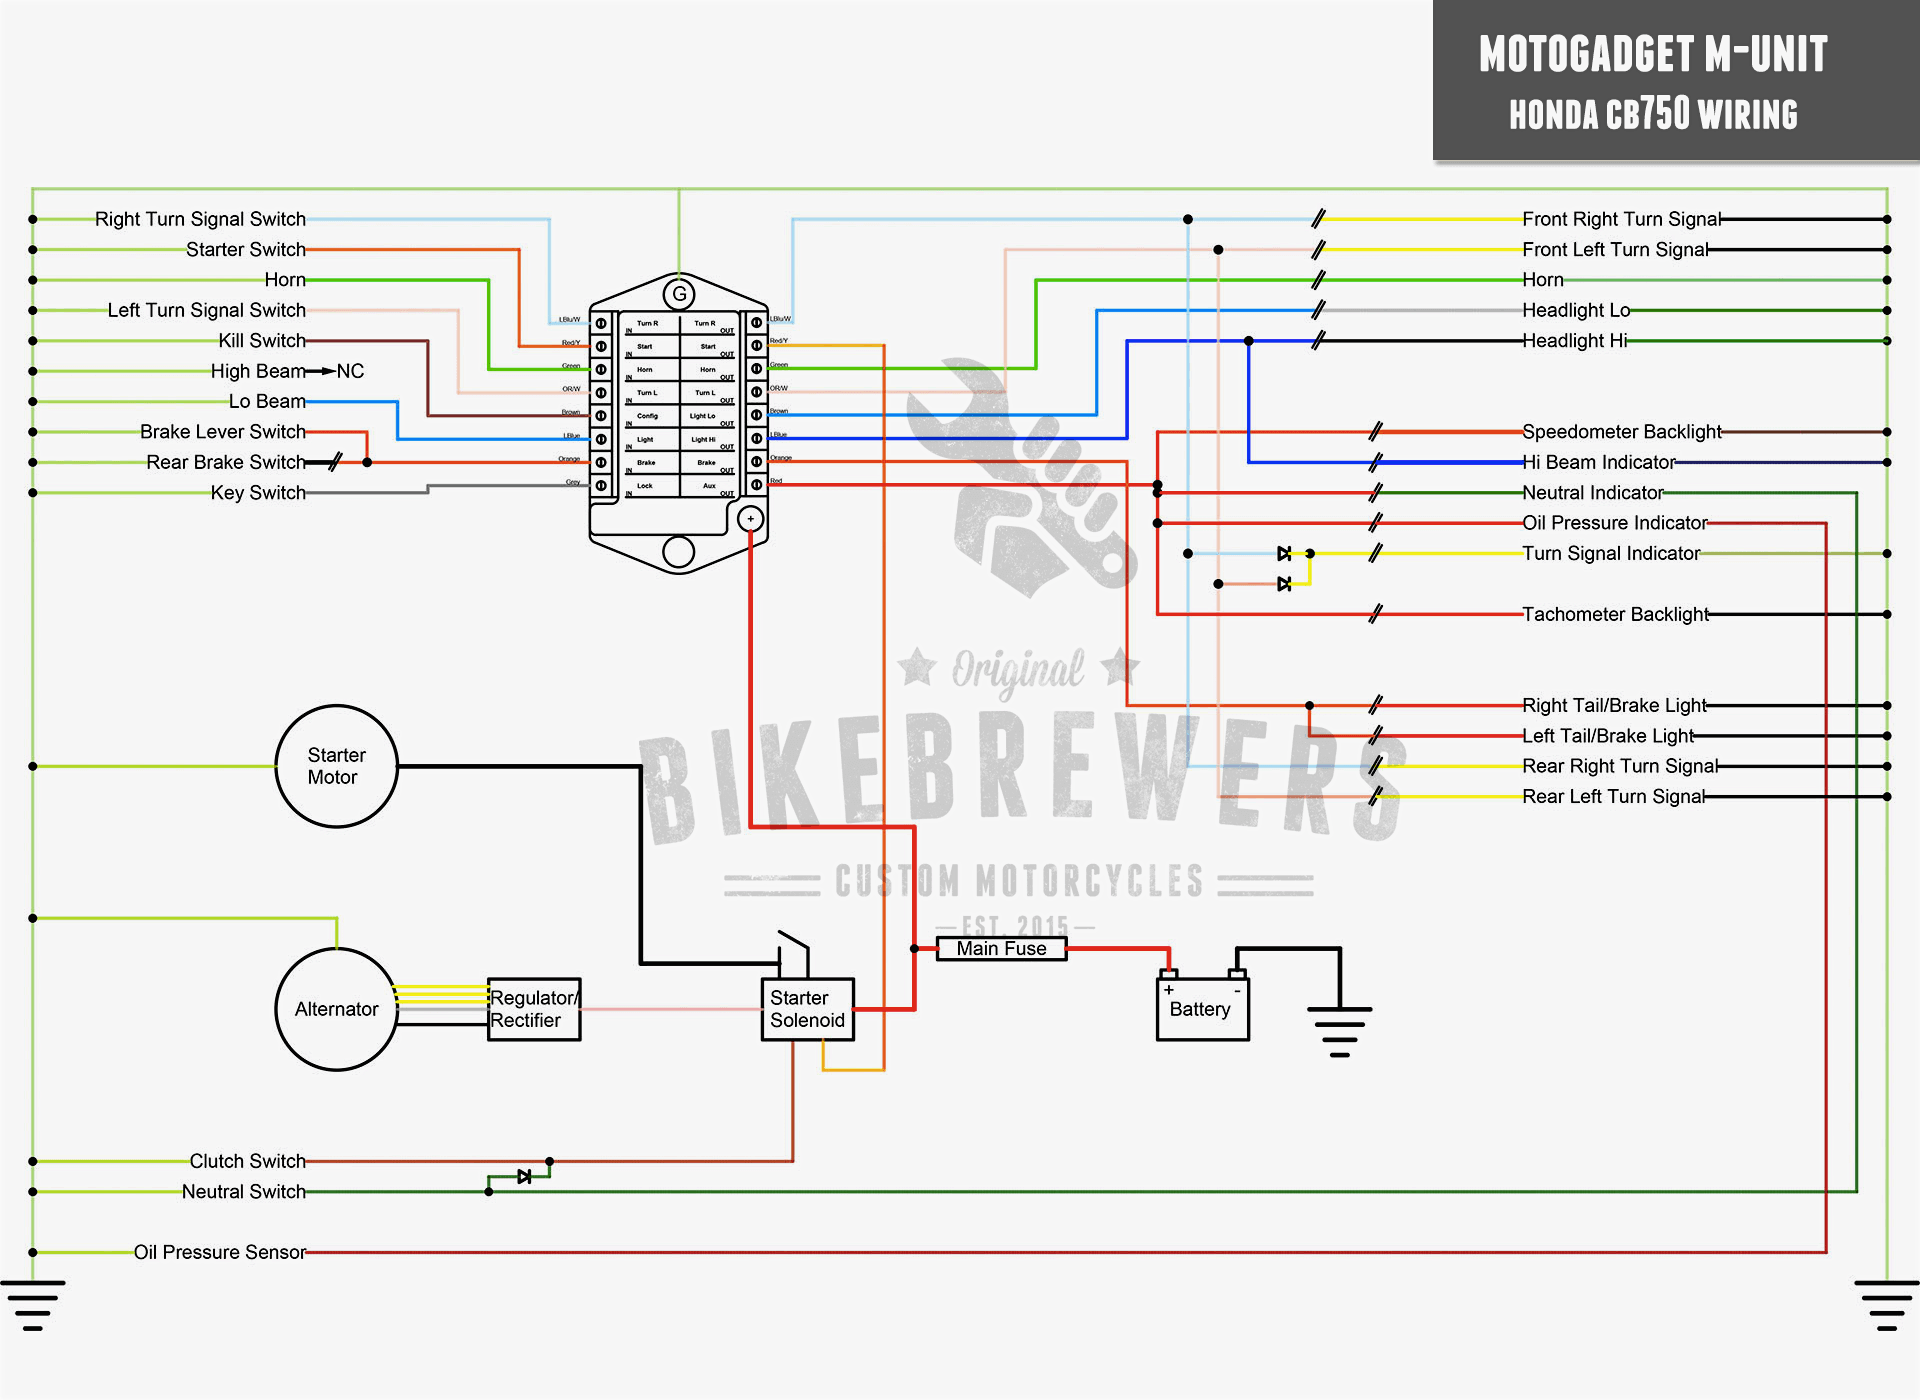 Wiring Diagram Spy Car Alarm Diagram Diagramtemplate Diagramsample Honda Cb750 Cb750 Honda